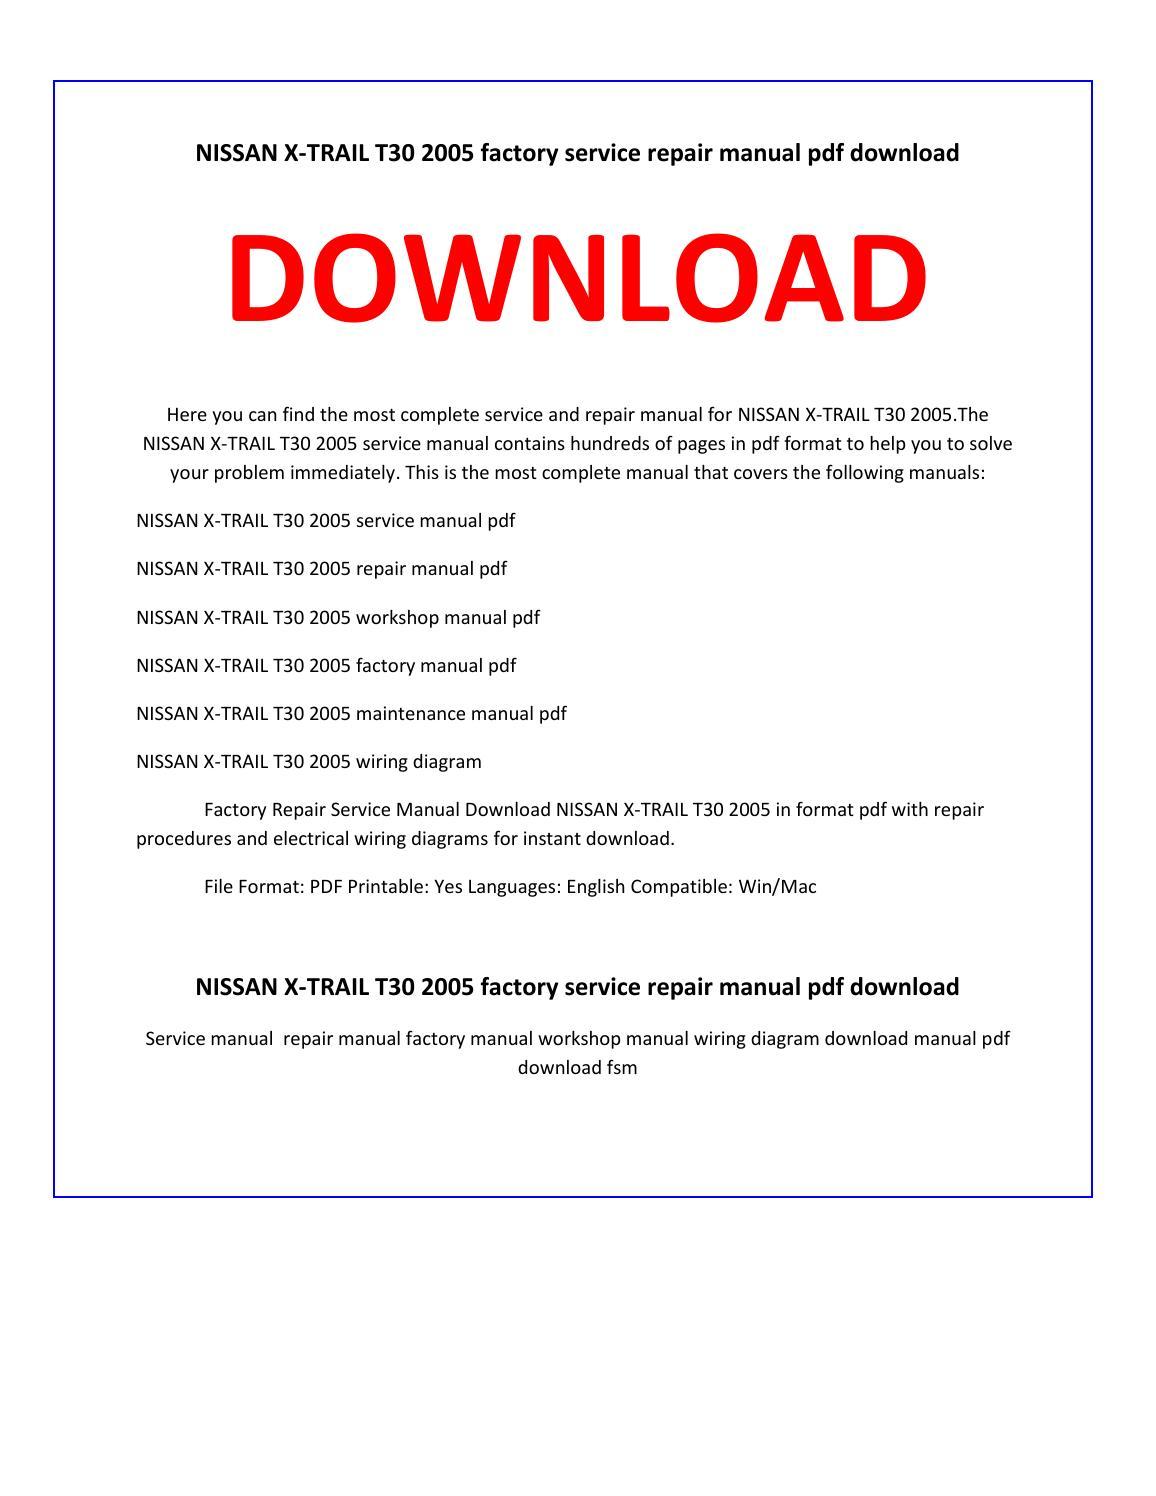 nissan x trail t30 2005 service repair manual